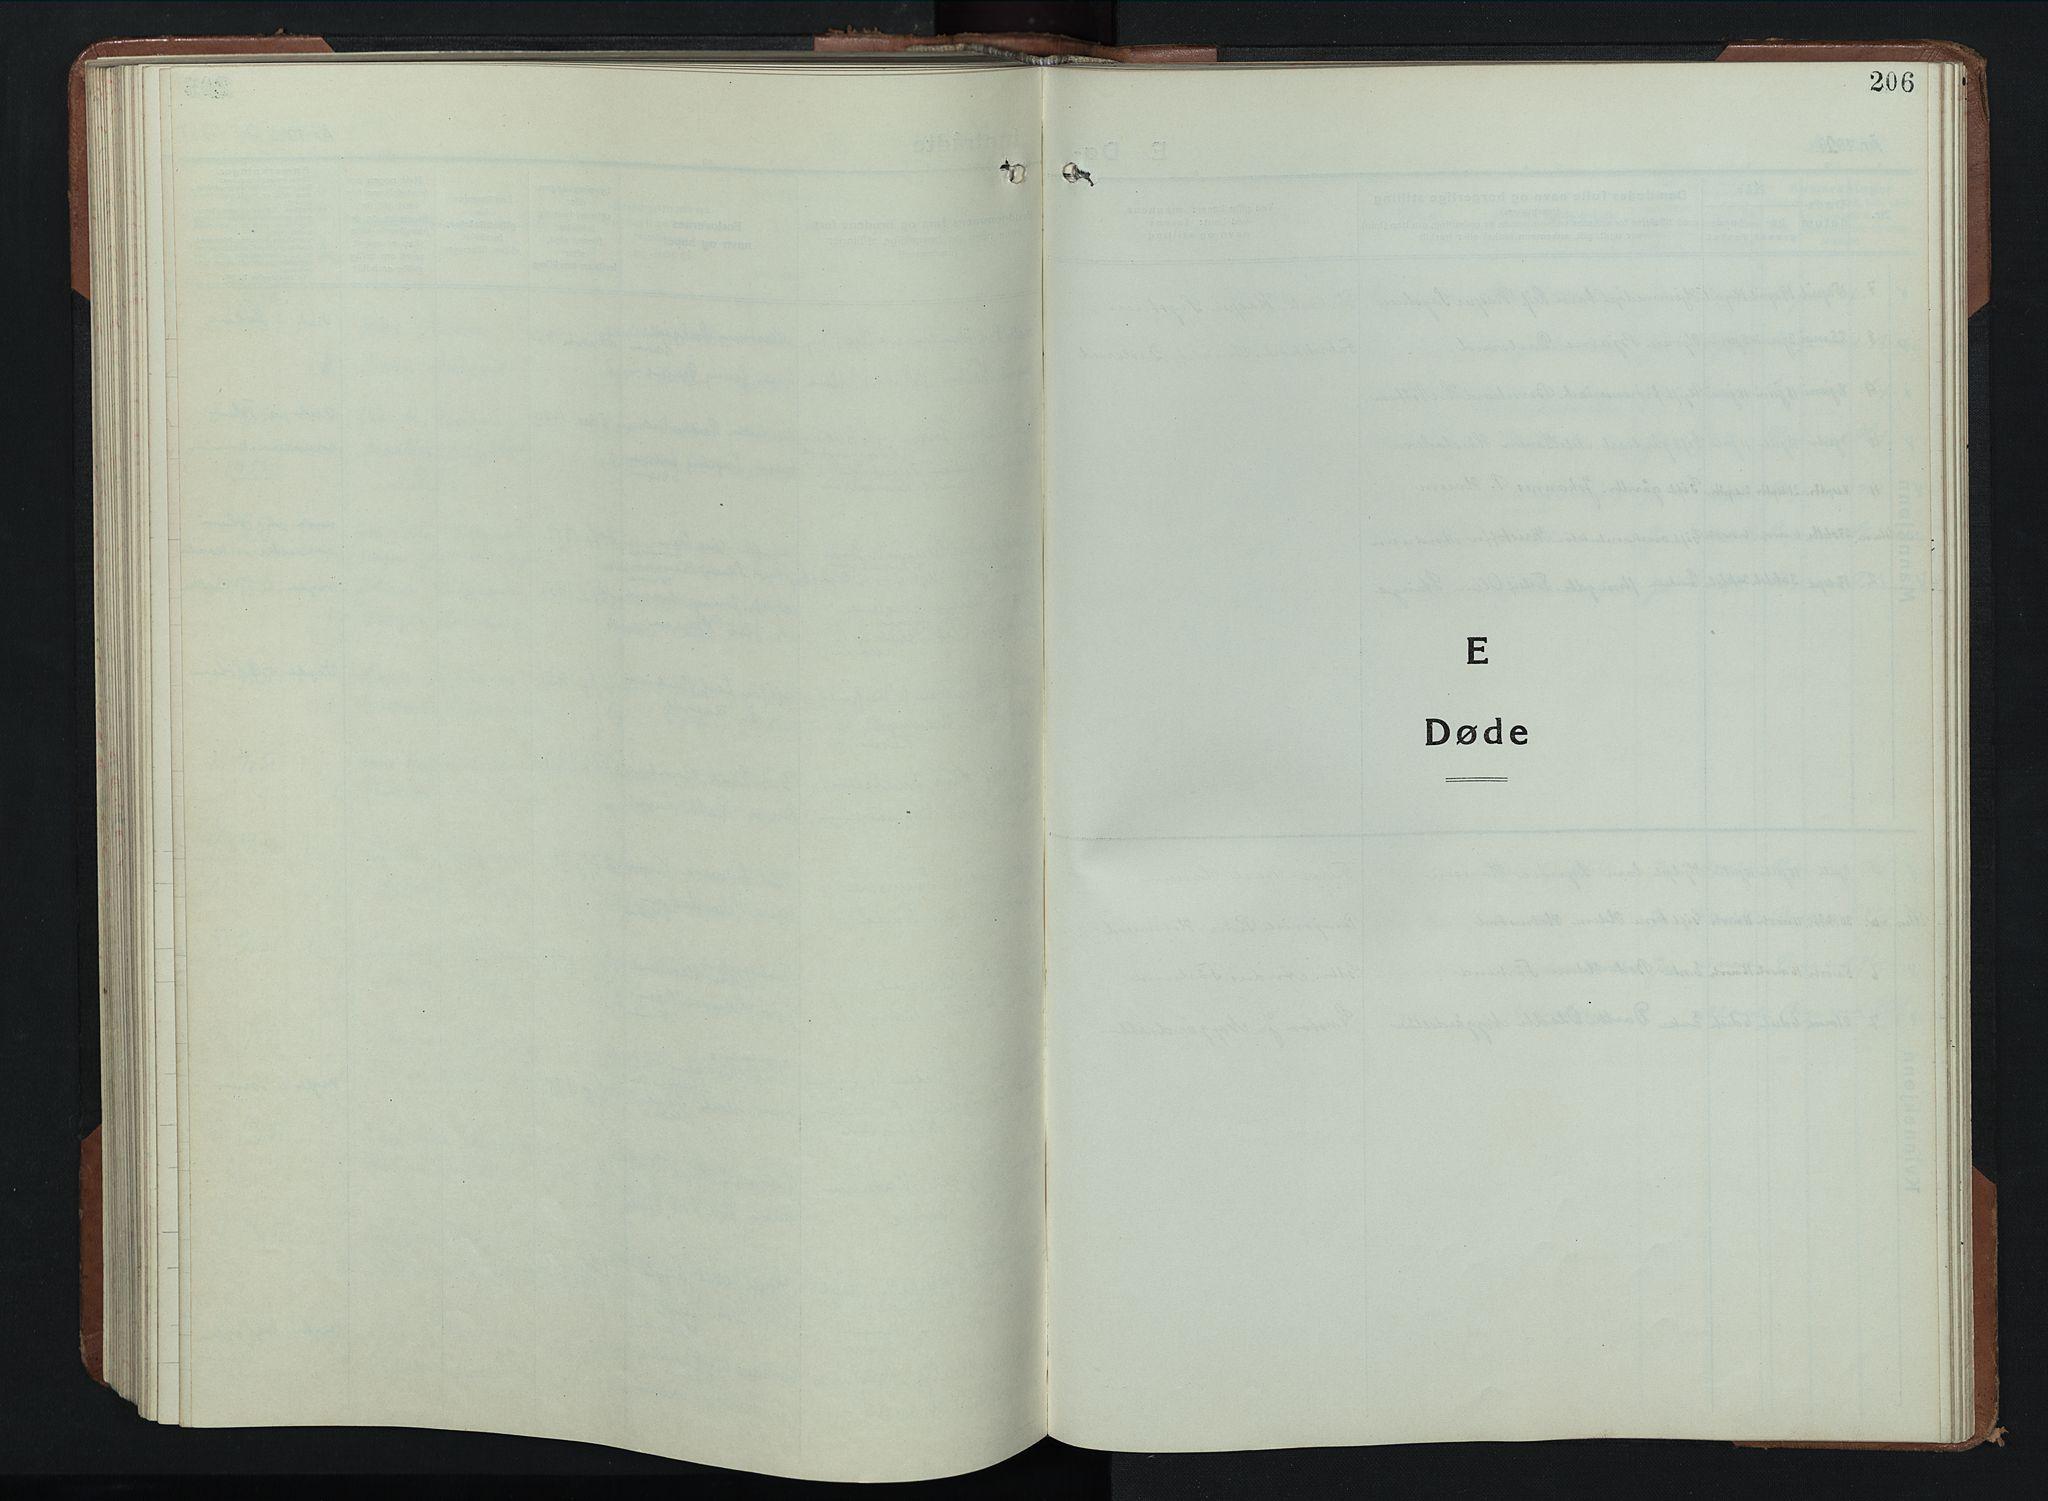 SAH, Balke prestekontor, Klokkerbok nr. 2, 1929-1951, s. 206